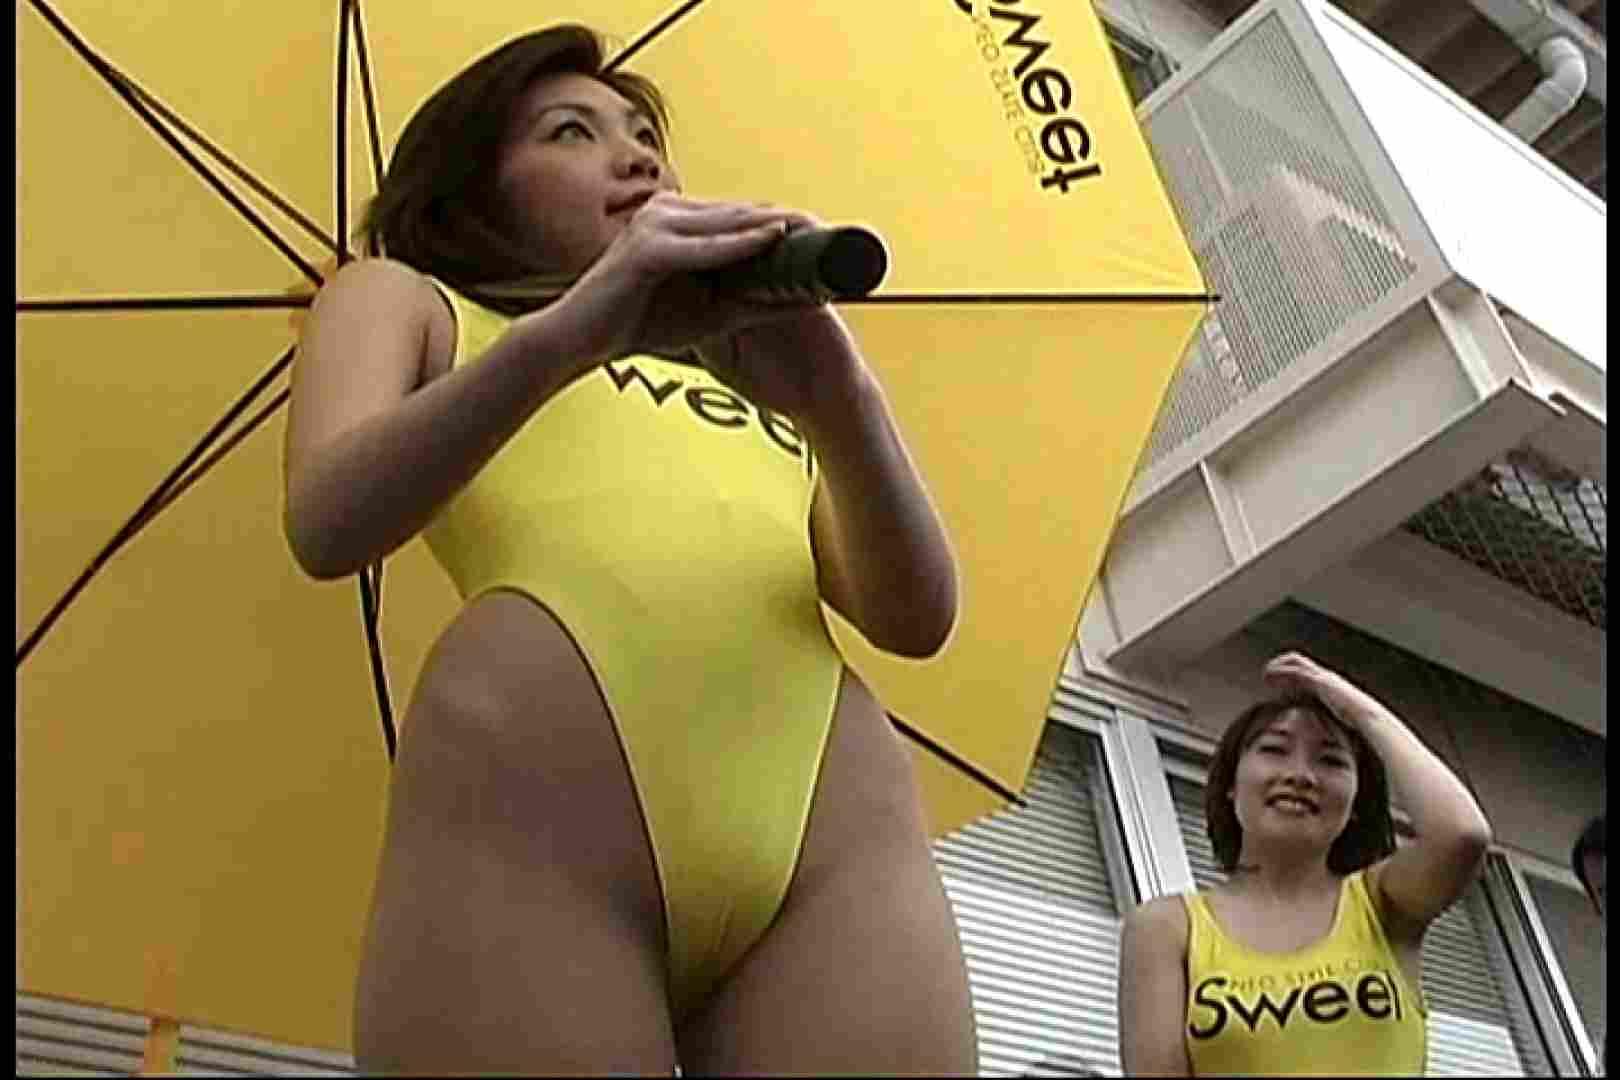 RQカメラ地獄Vol.7 お尻 覗き性交動画流出 89PICs 23